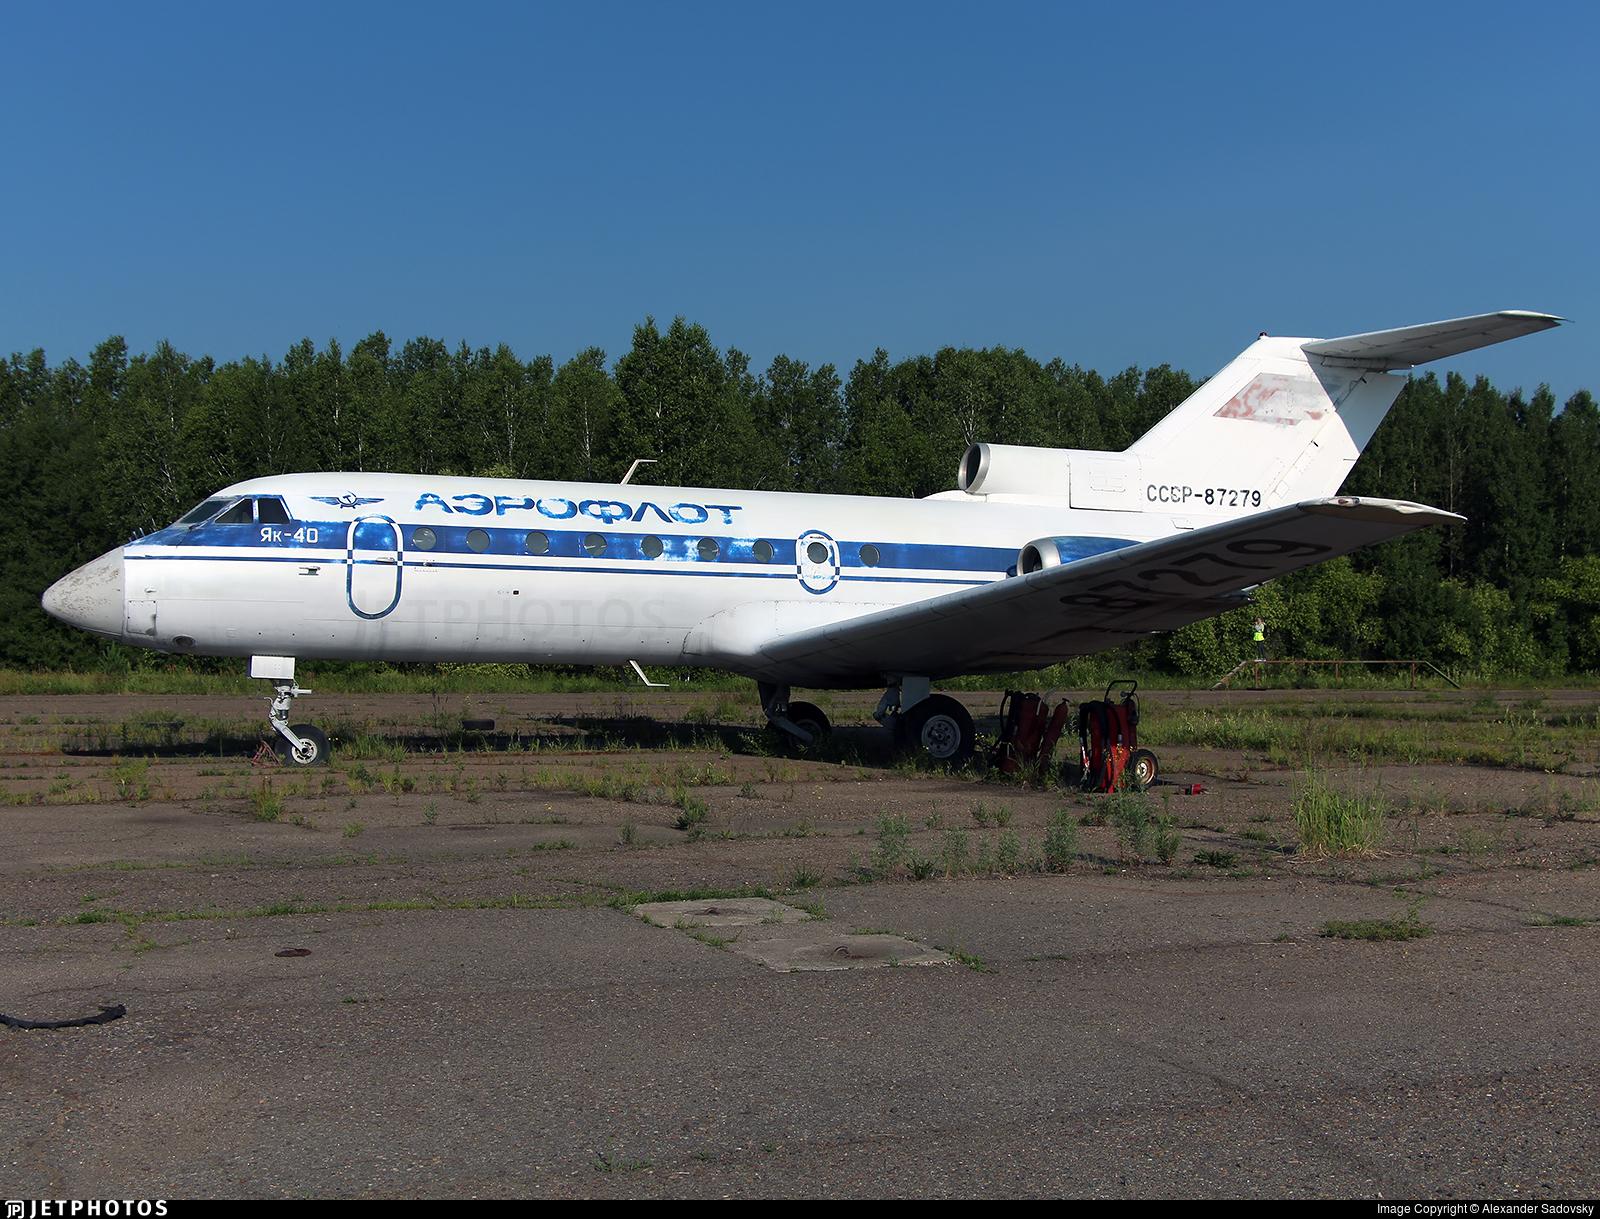 CCCP-87279 - Yakovlev Yak-40 - Aeroflot